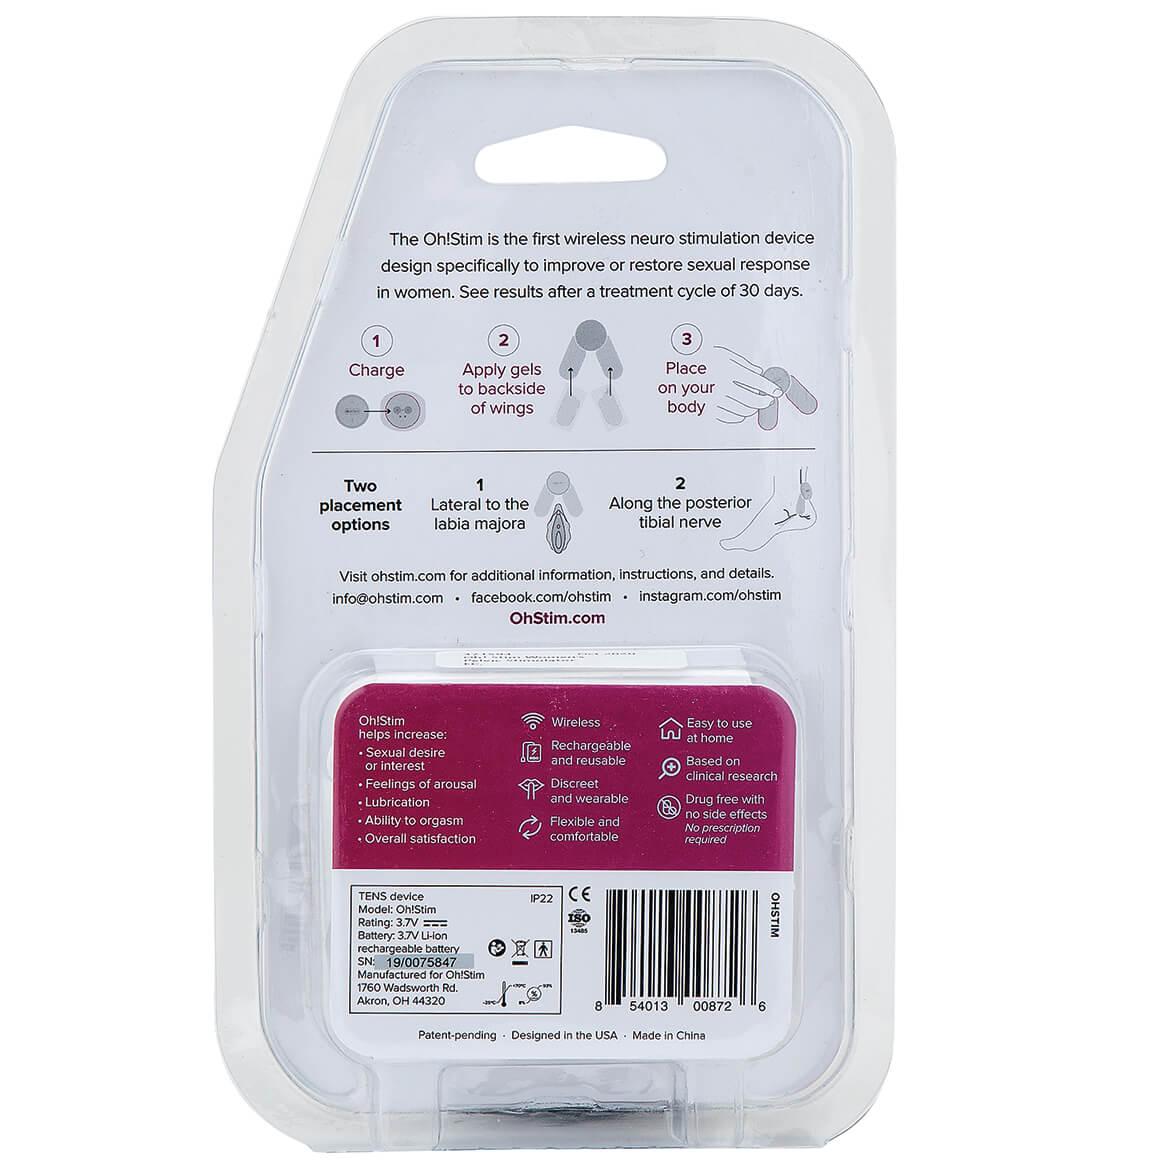 Oh! Stim Women's Pelvic Stimulator-371594